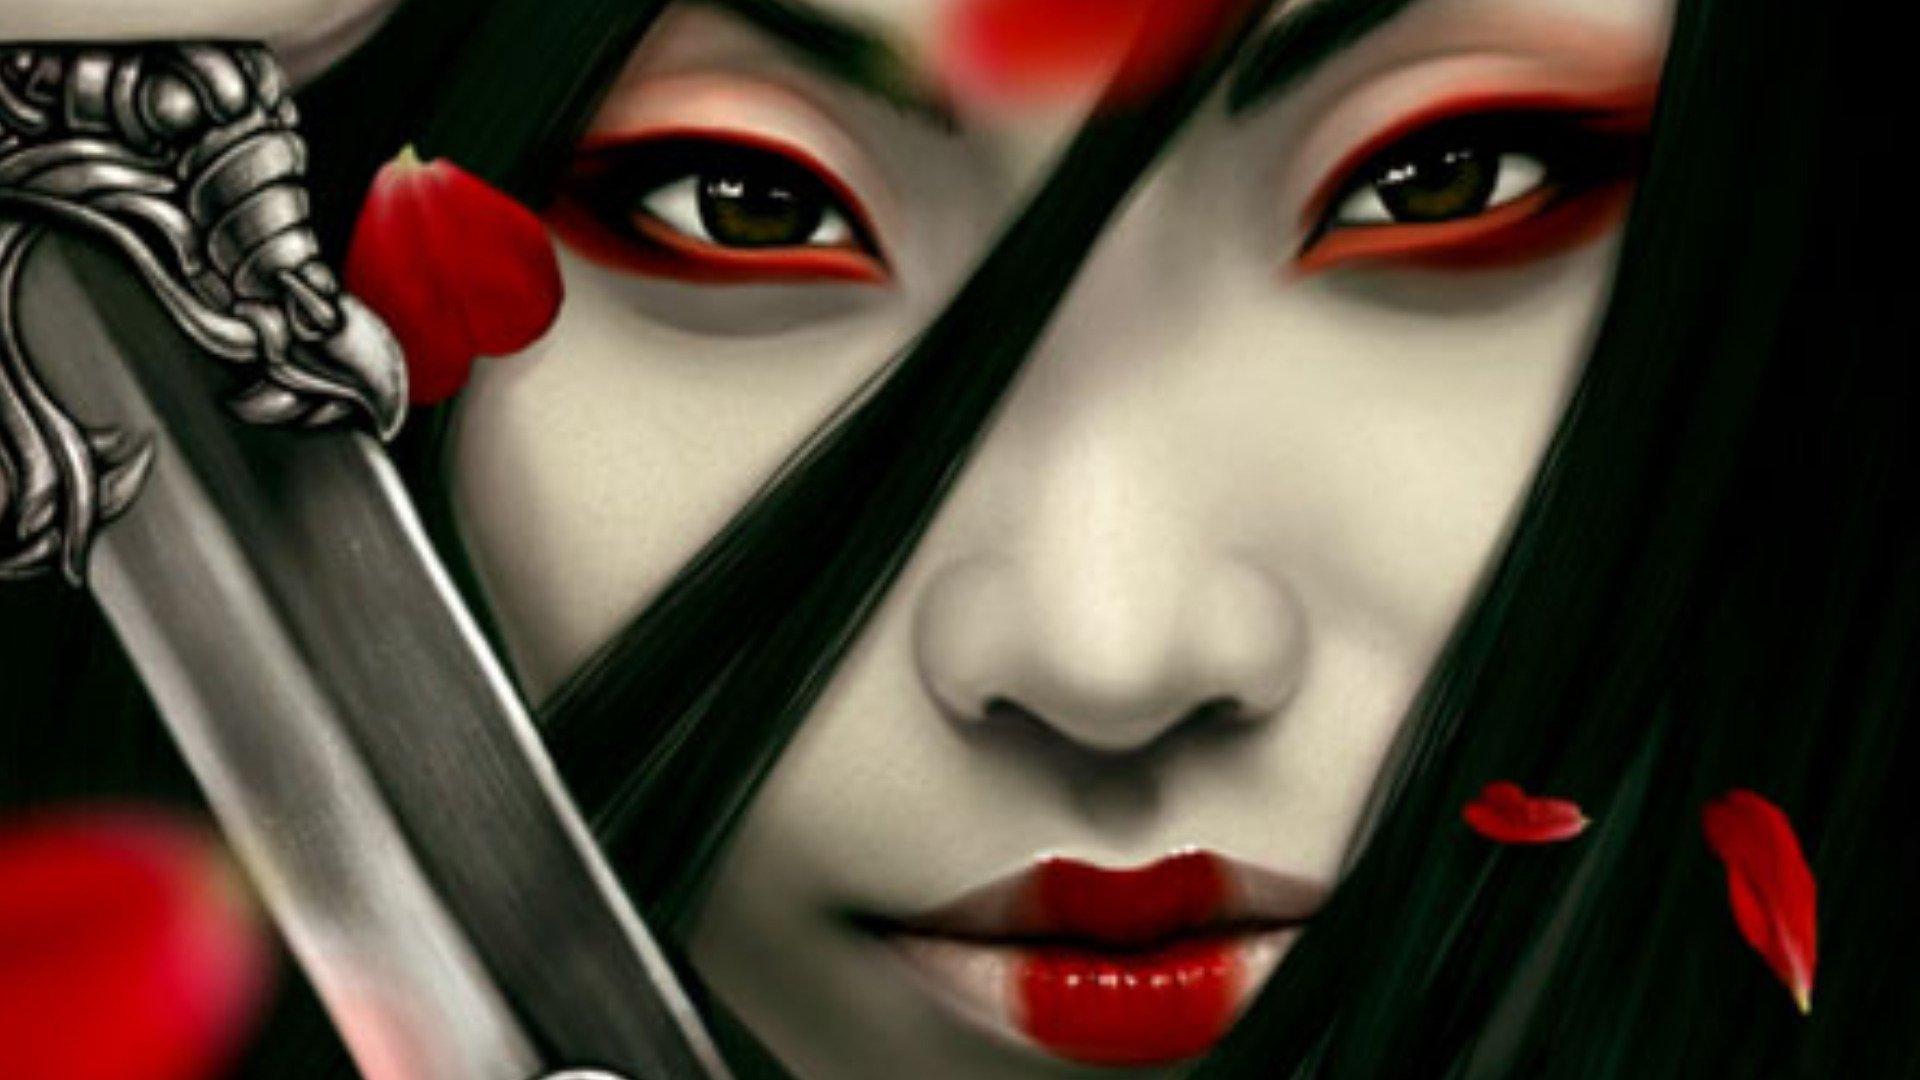 Women Warrior Hd Wallpaper  Background Image  1920X1080  Id267064 - Wallpaper Abyss-8814